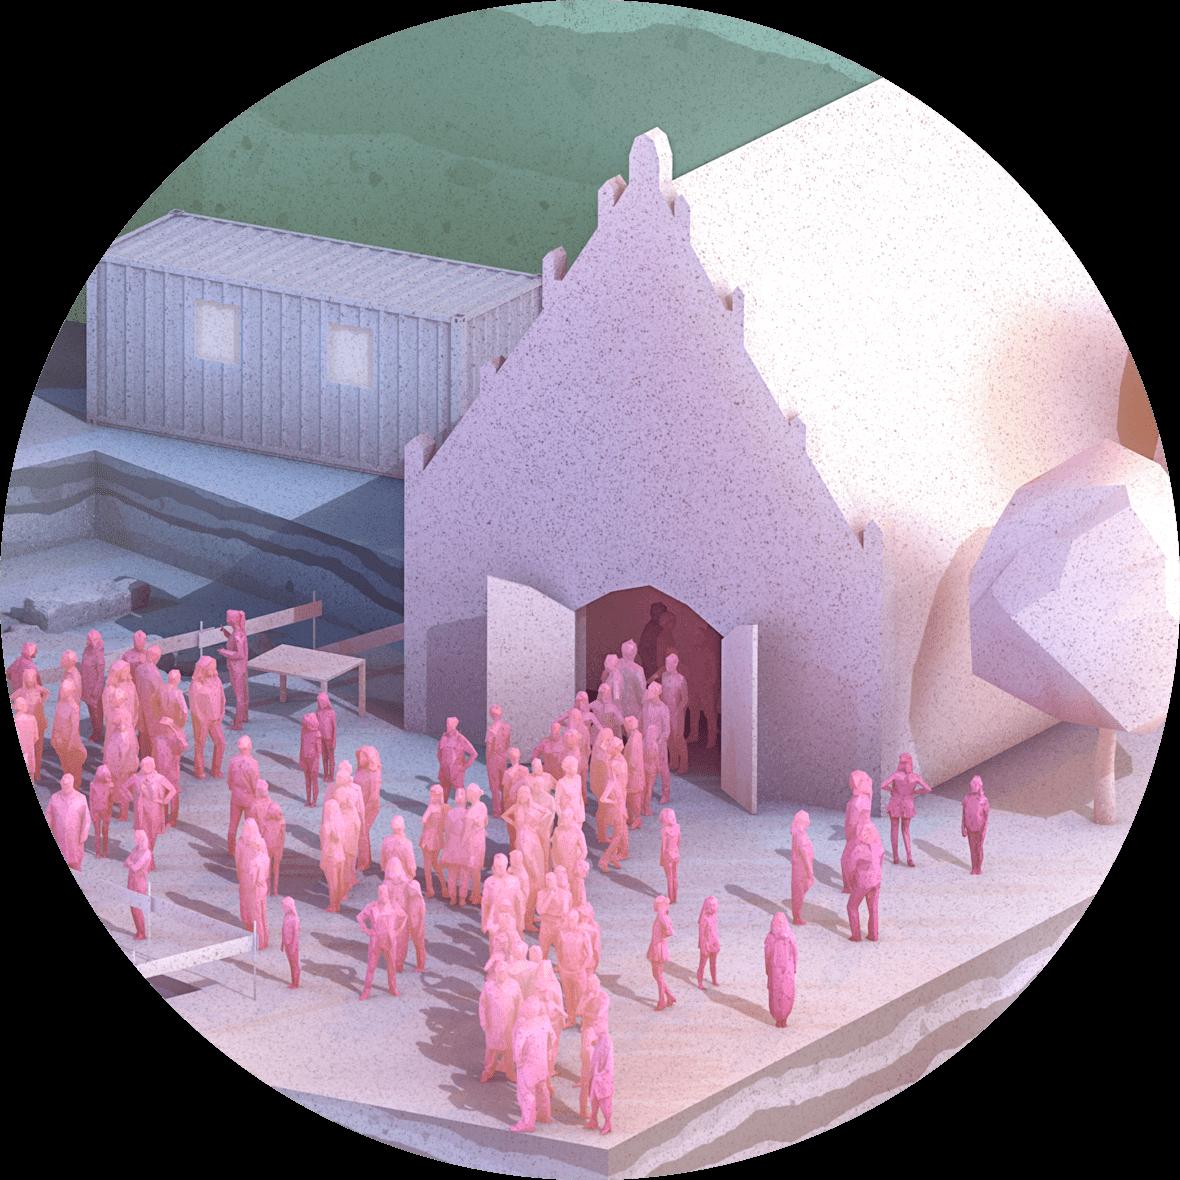 Kantonsarchaeologie, Denkmalpflege, Zuerich, Faltplakat, ikonaut, 3D-Visualisierung